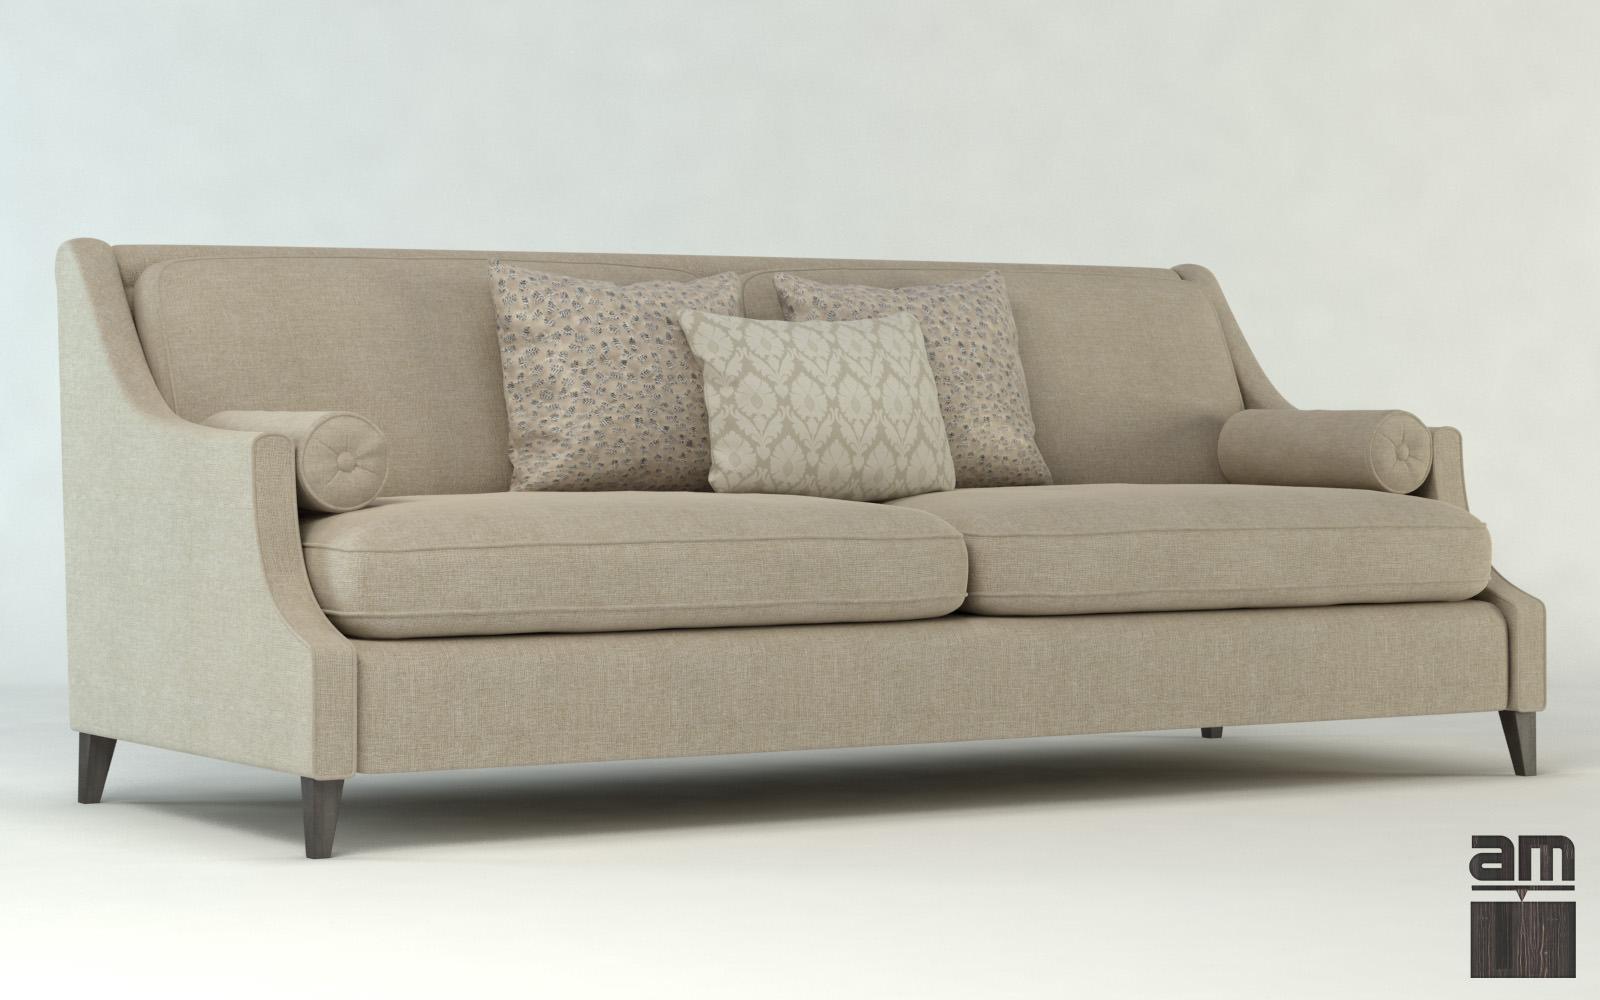 Modern sofa dubai 3d model max obj mtl fbx 1